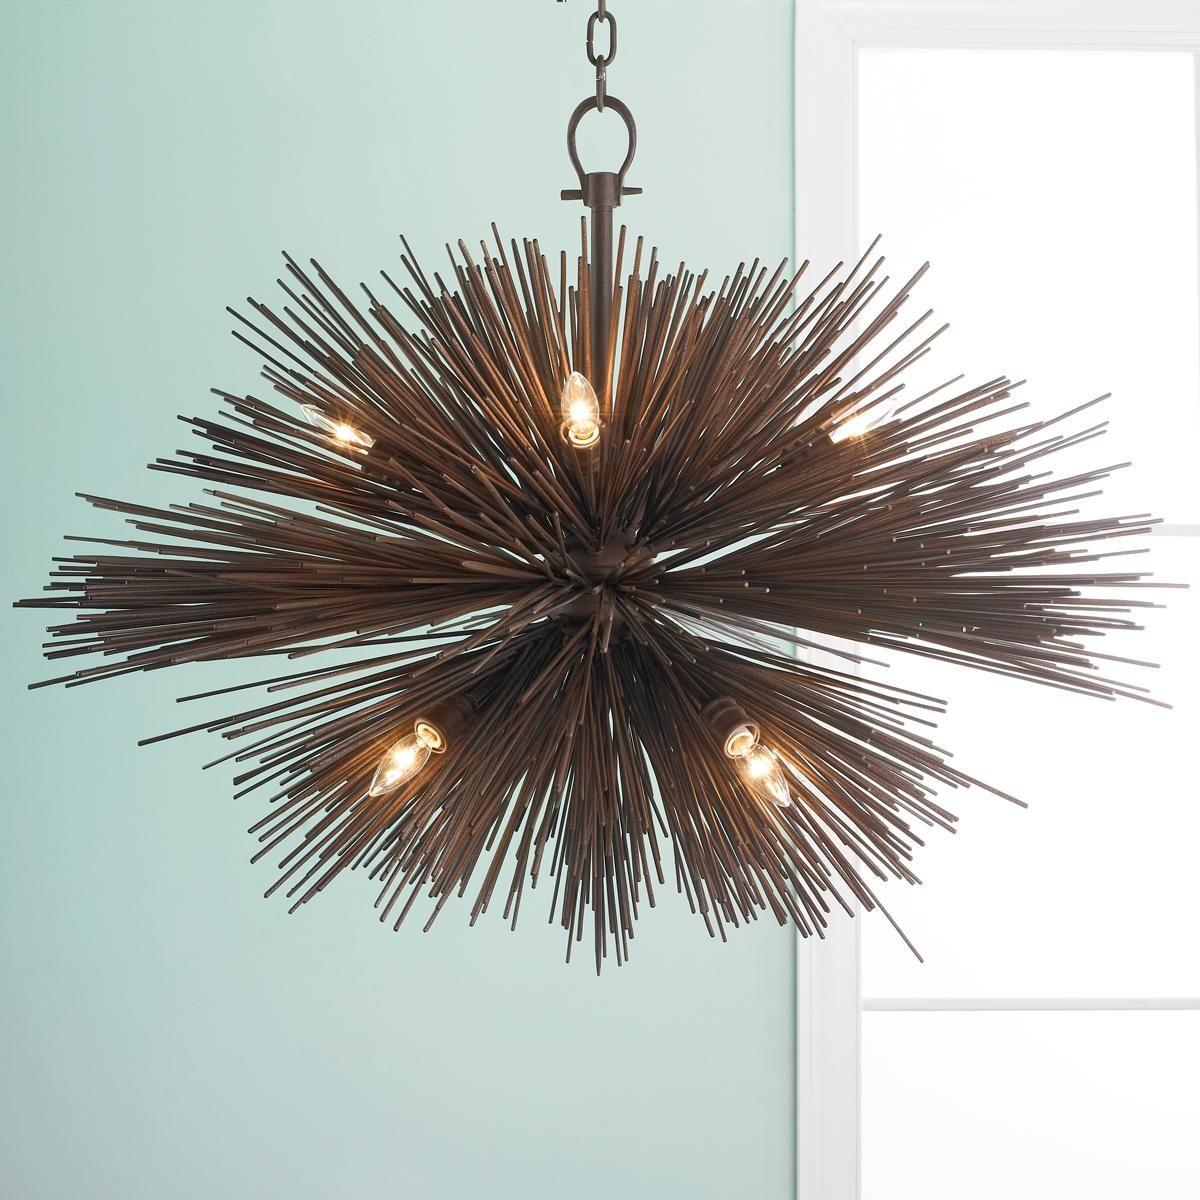 Spike Chandelier Medium Bronze Iron Spikes Burst Into A Modern Urban Style To Create This Dramatic Dining Room LightingDining